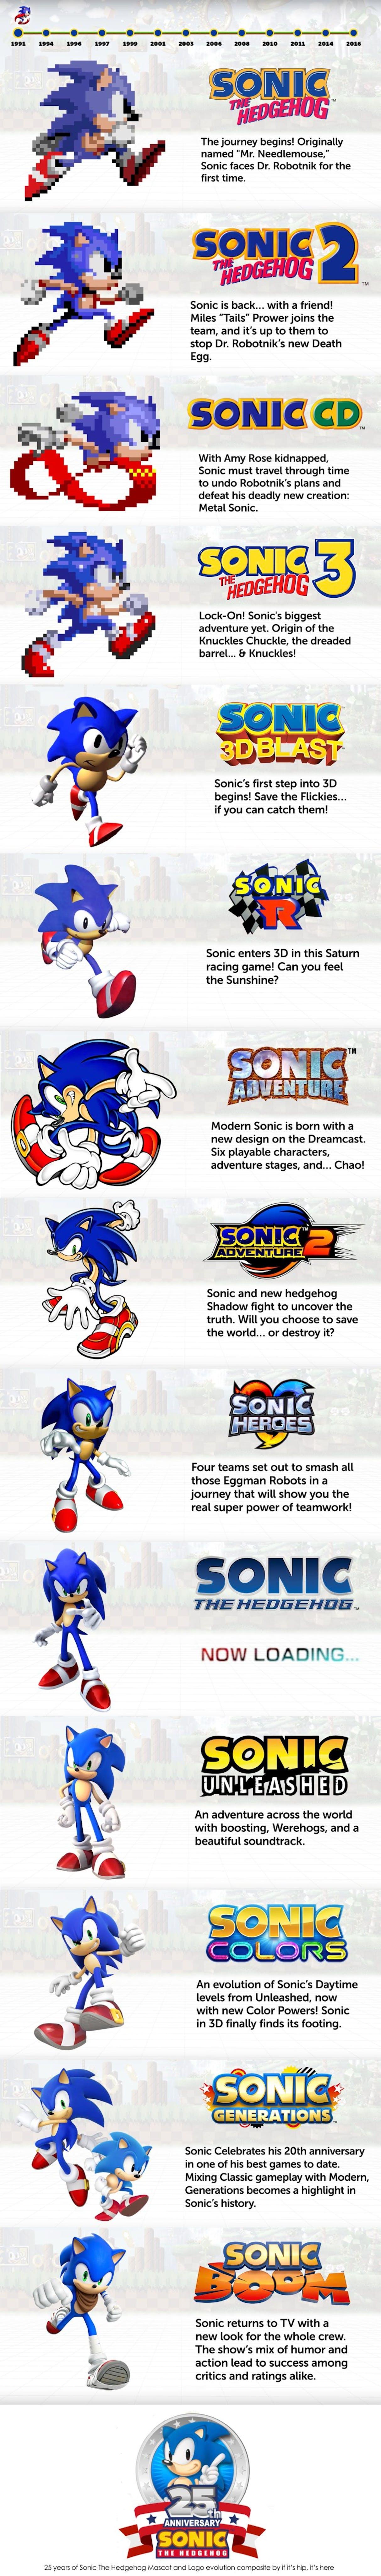 Sonic the Hedgehog Evolution